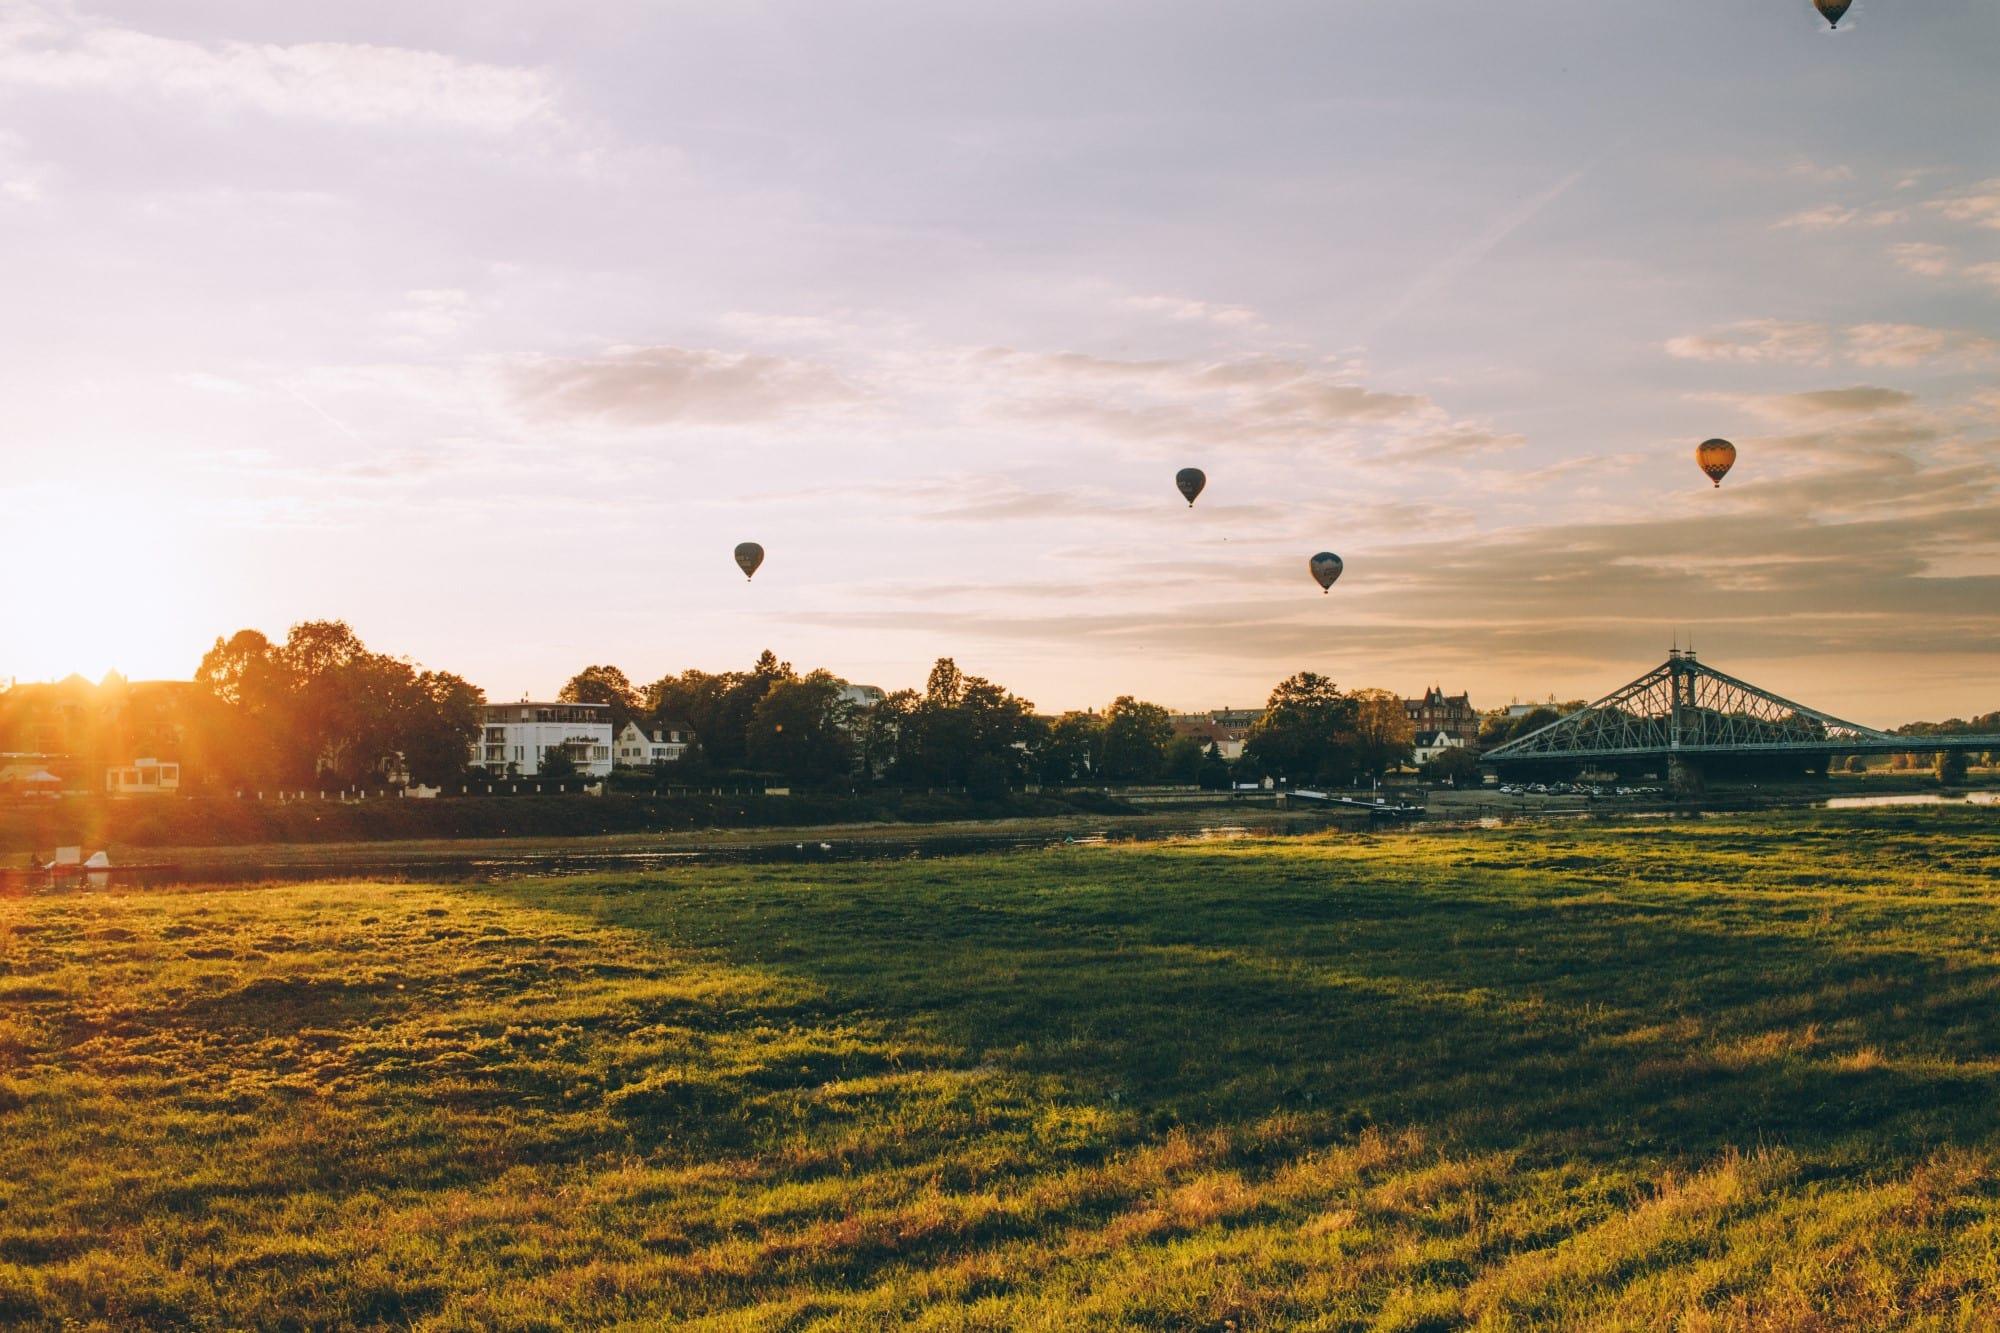 Fine-Art Print: Heißluftballons